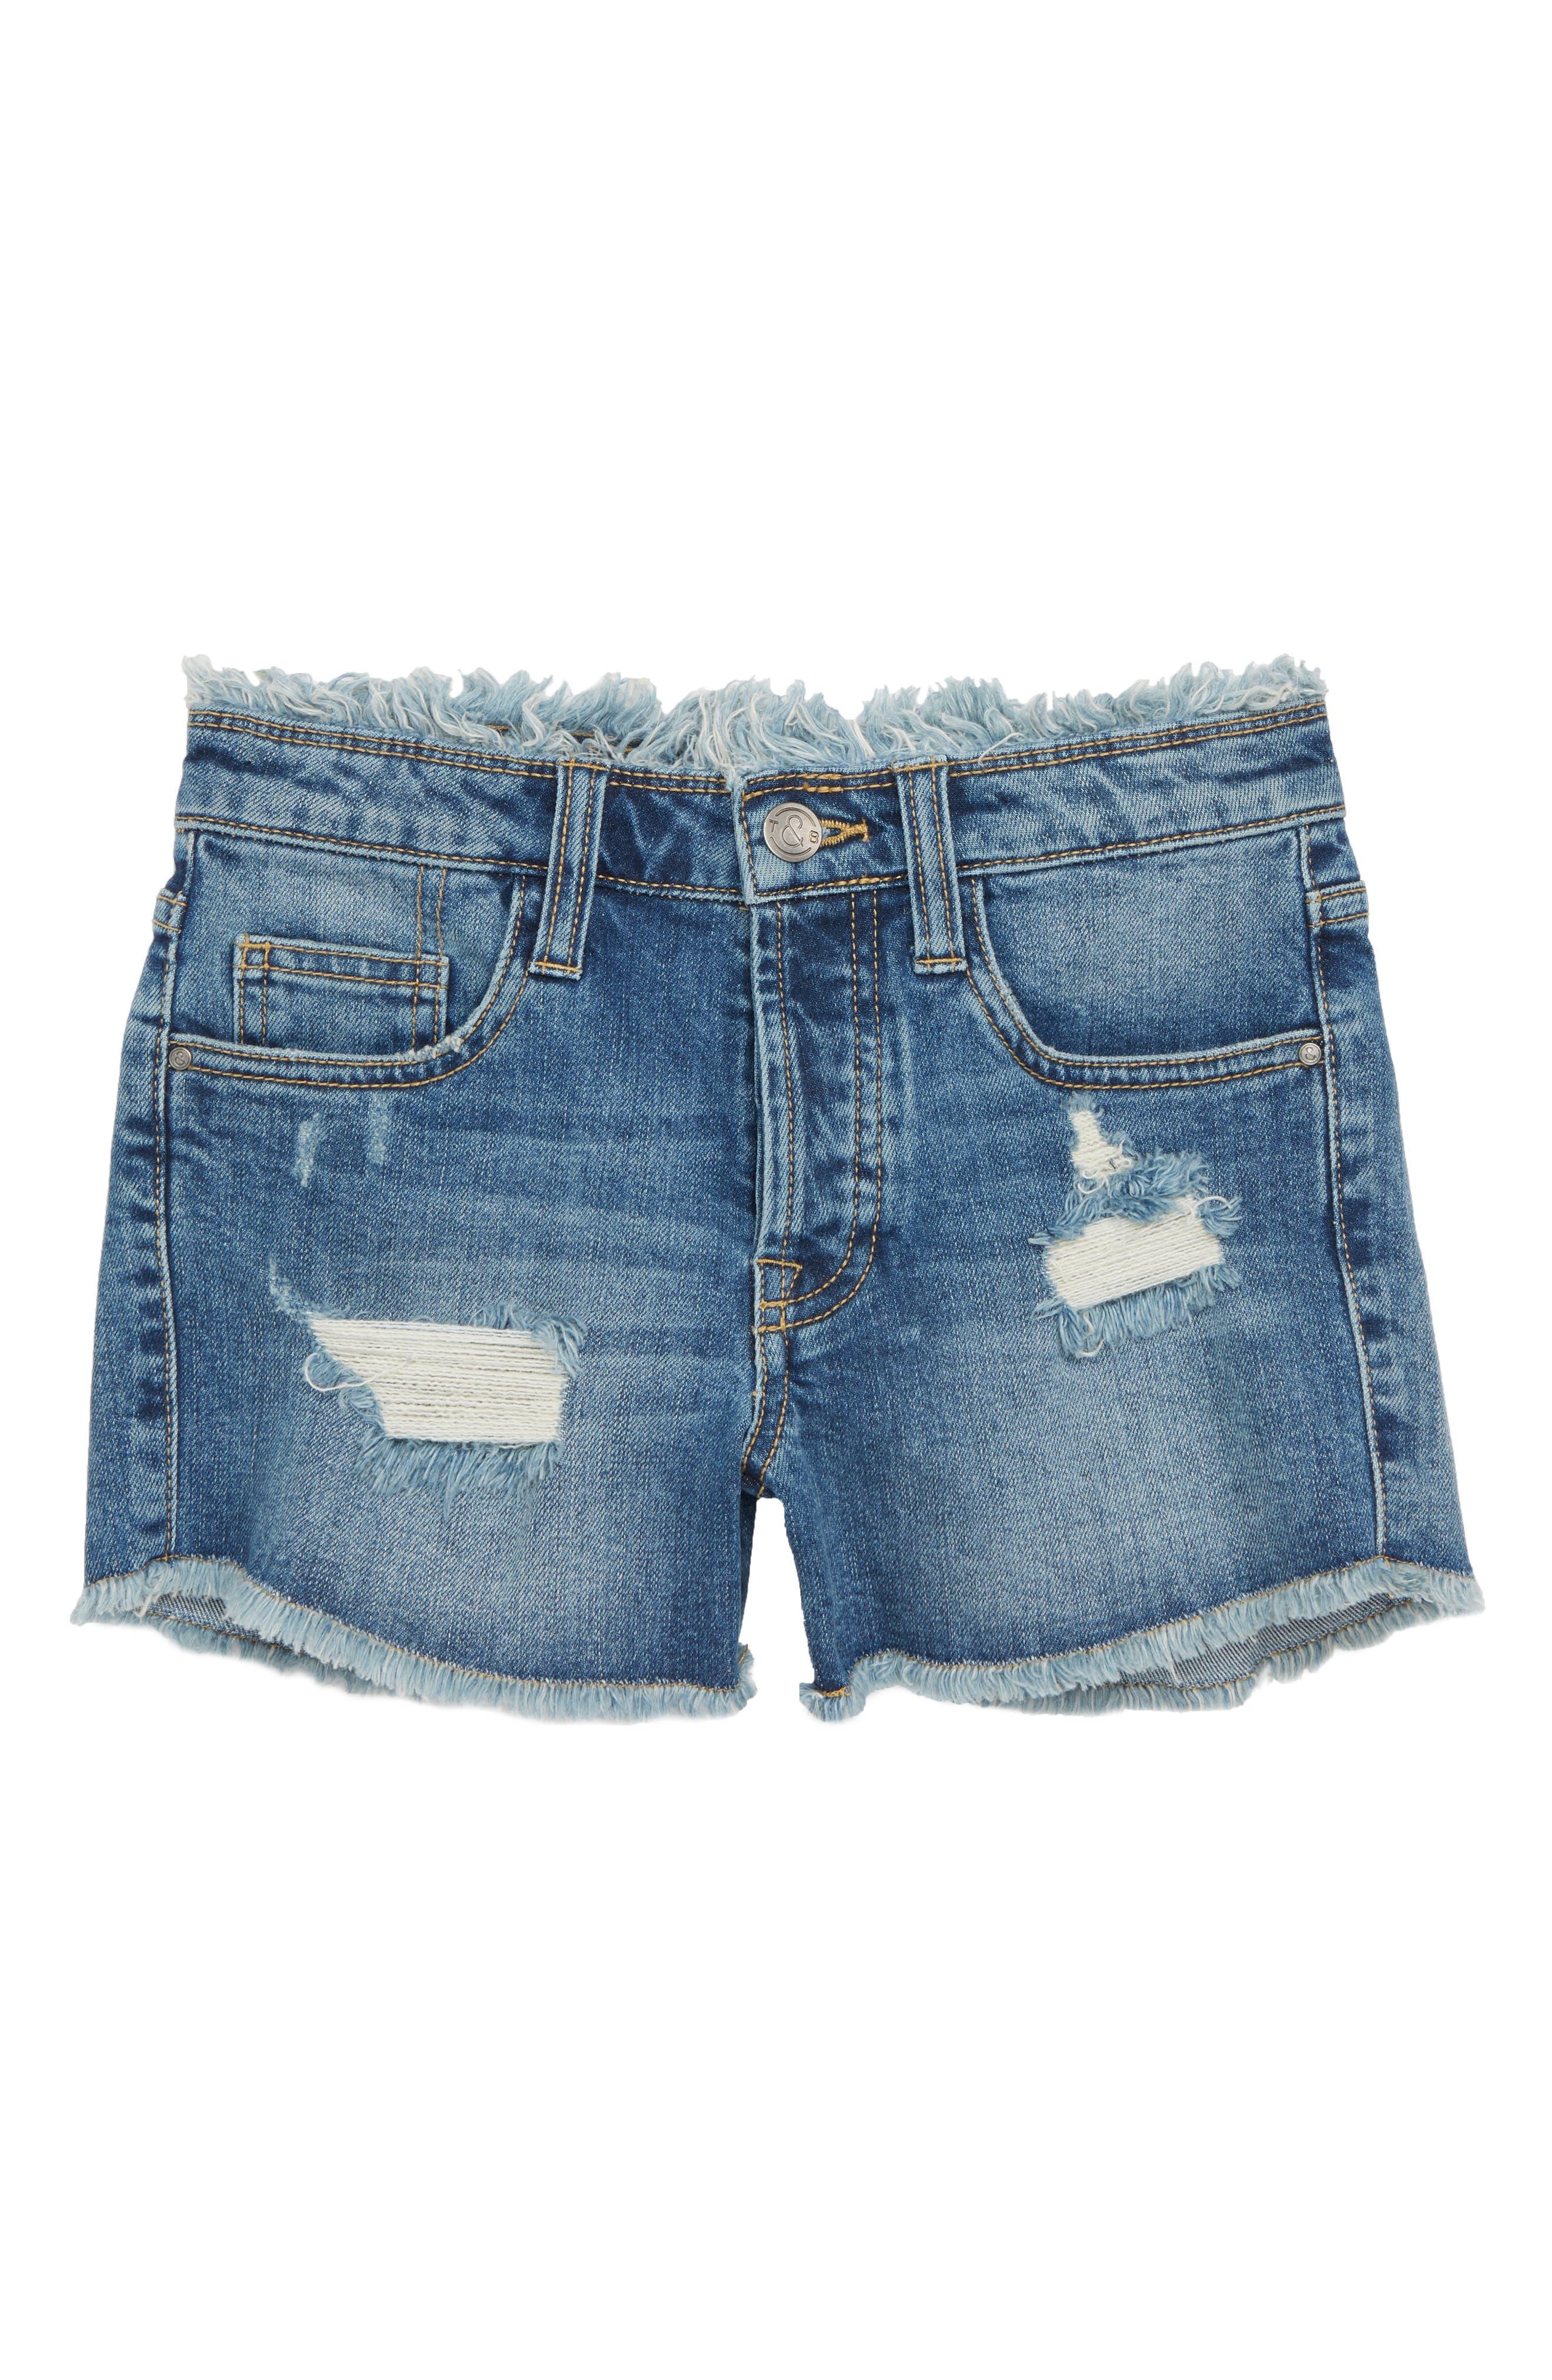 Festival Distressed Cutoff Denim Shorts,                         Main,                         color,